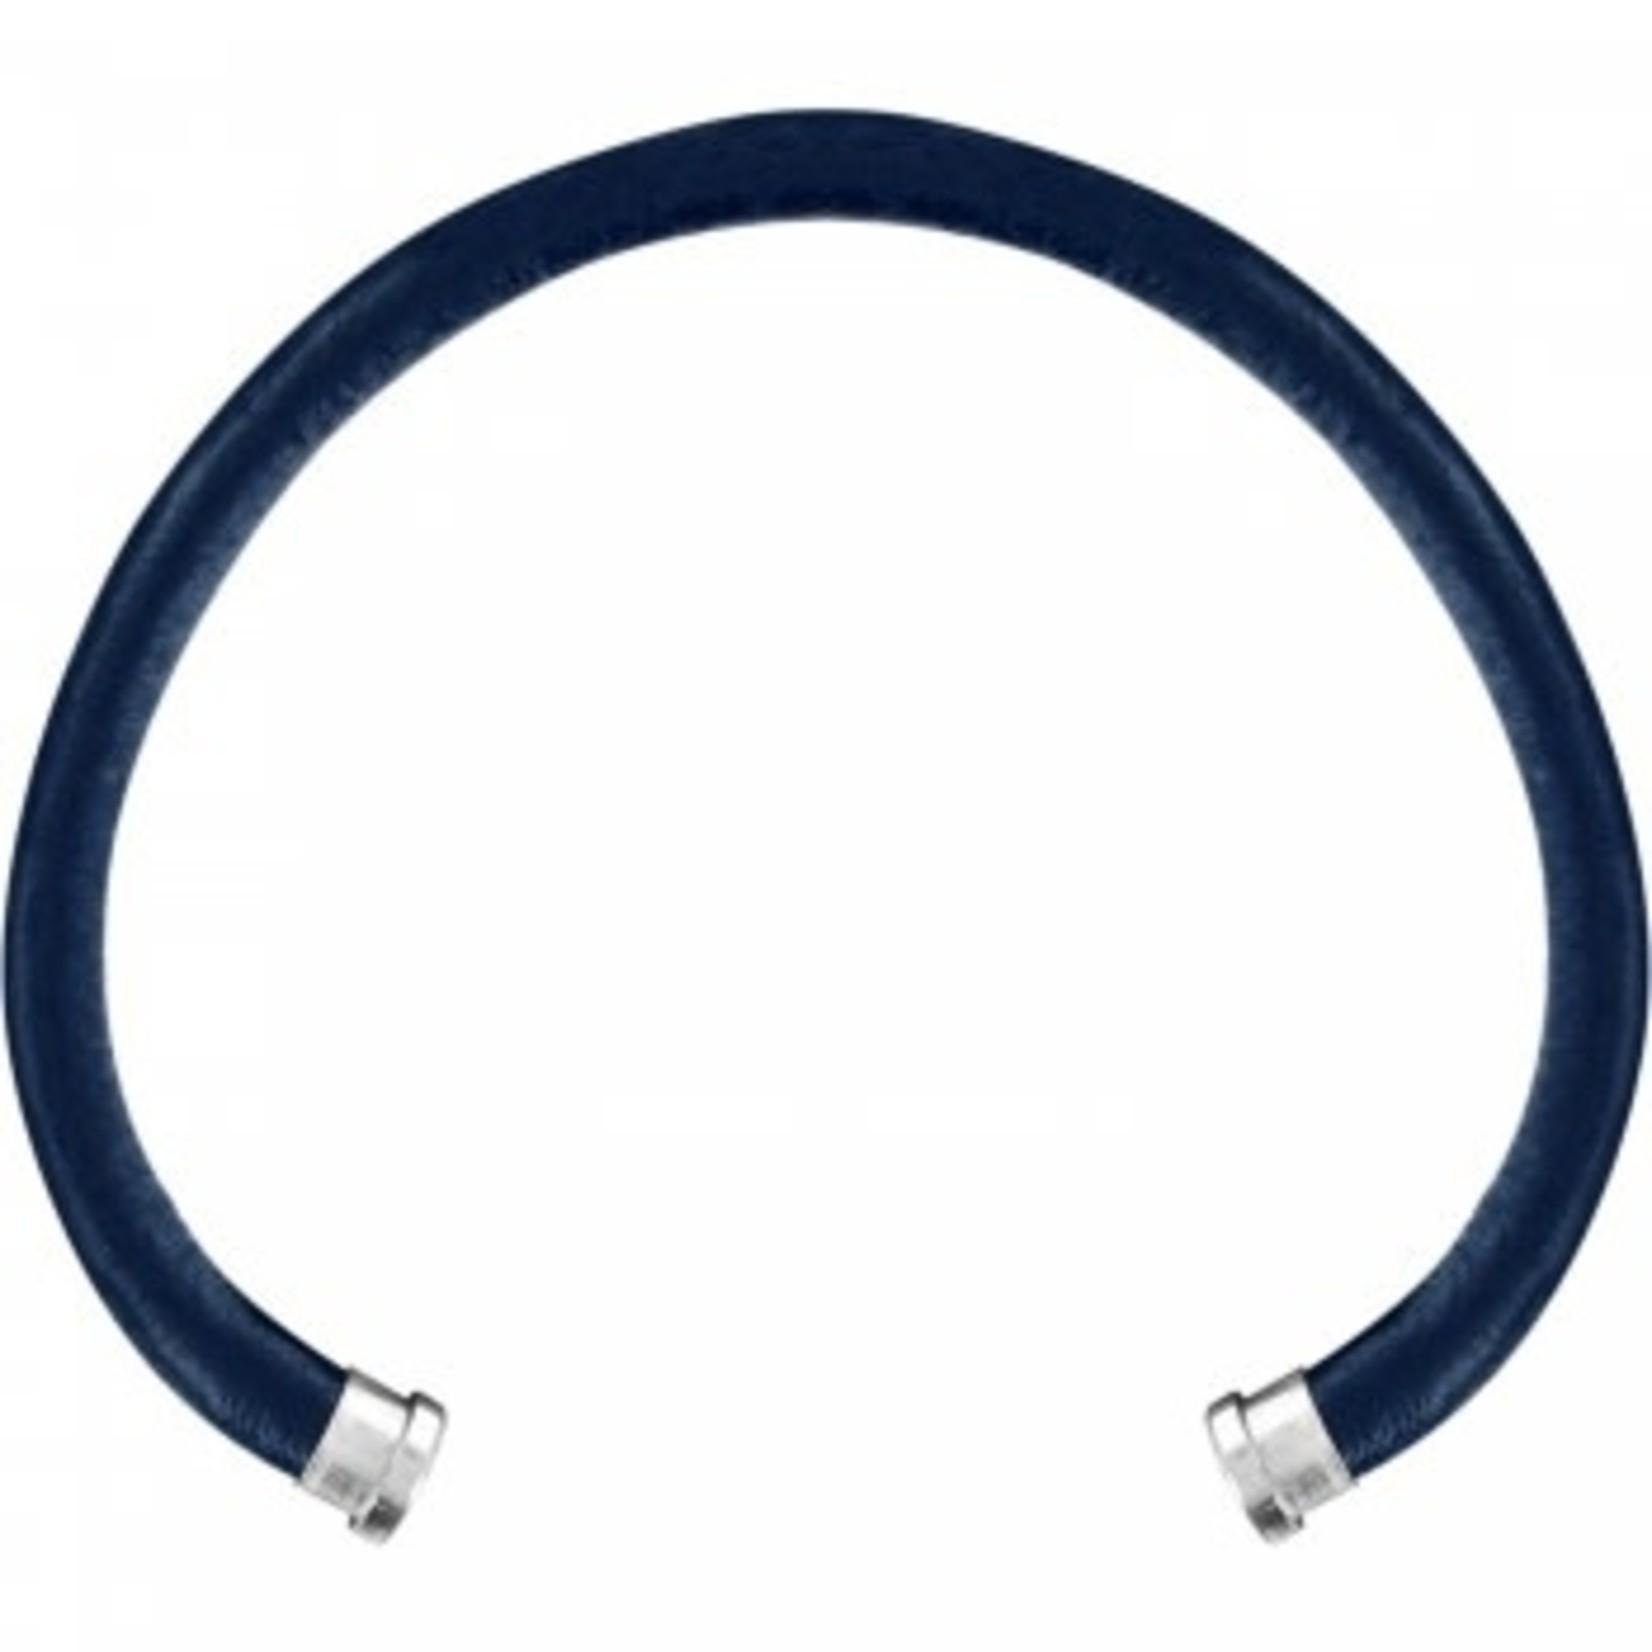 Brighton Color Clique Leather Cord in Navy M/L